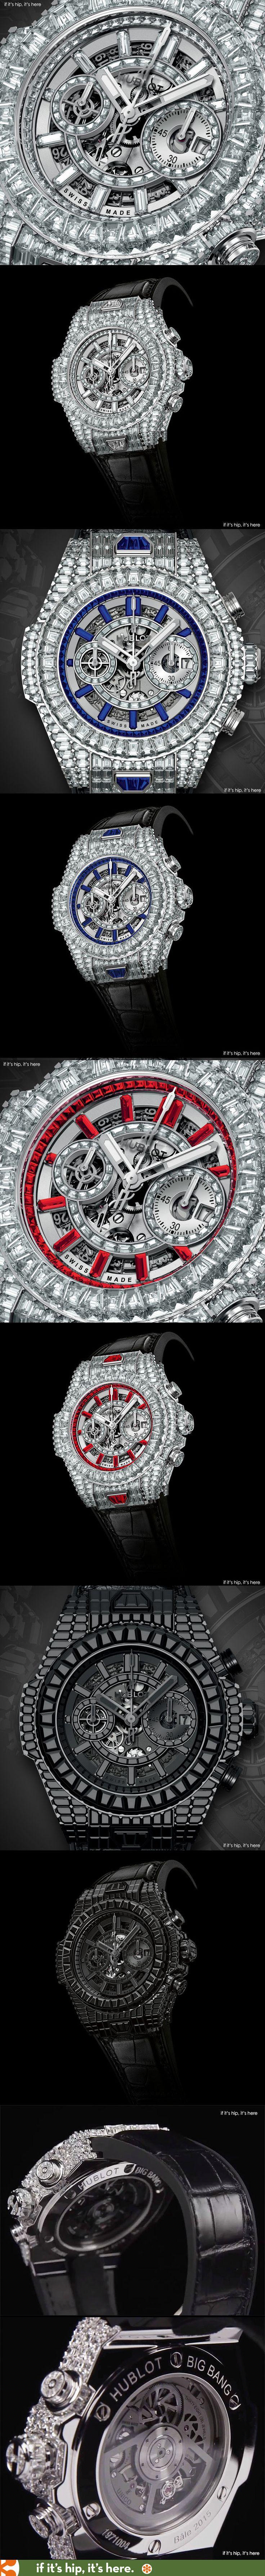 c544c378daeb0a6ea50e20a21b100b59--hublot-watches-buy-watch Spannende 40 Fuß Meter Dekorationen